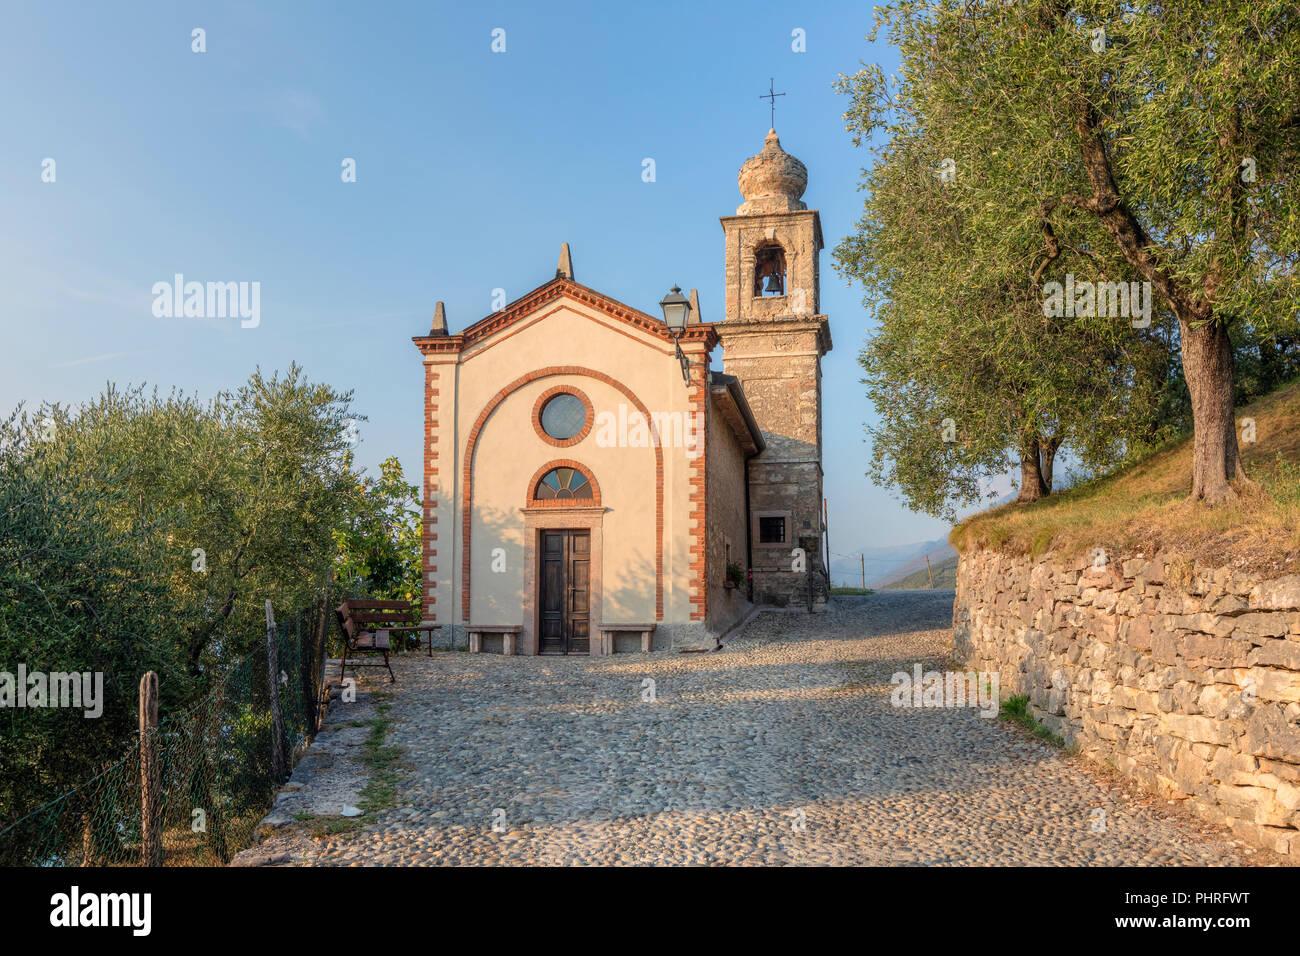 Crero, San Siro, Veneto, Lake Garda, Italy, Europe Stock Photo